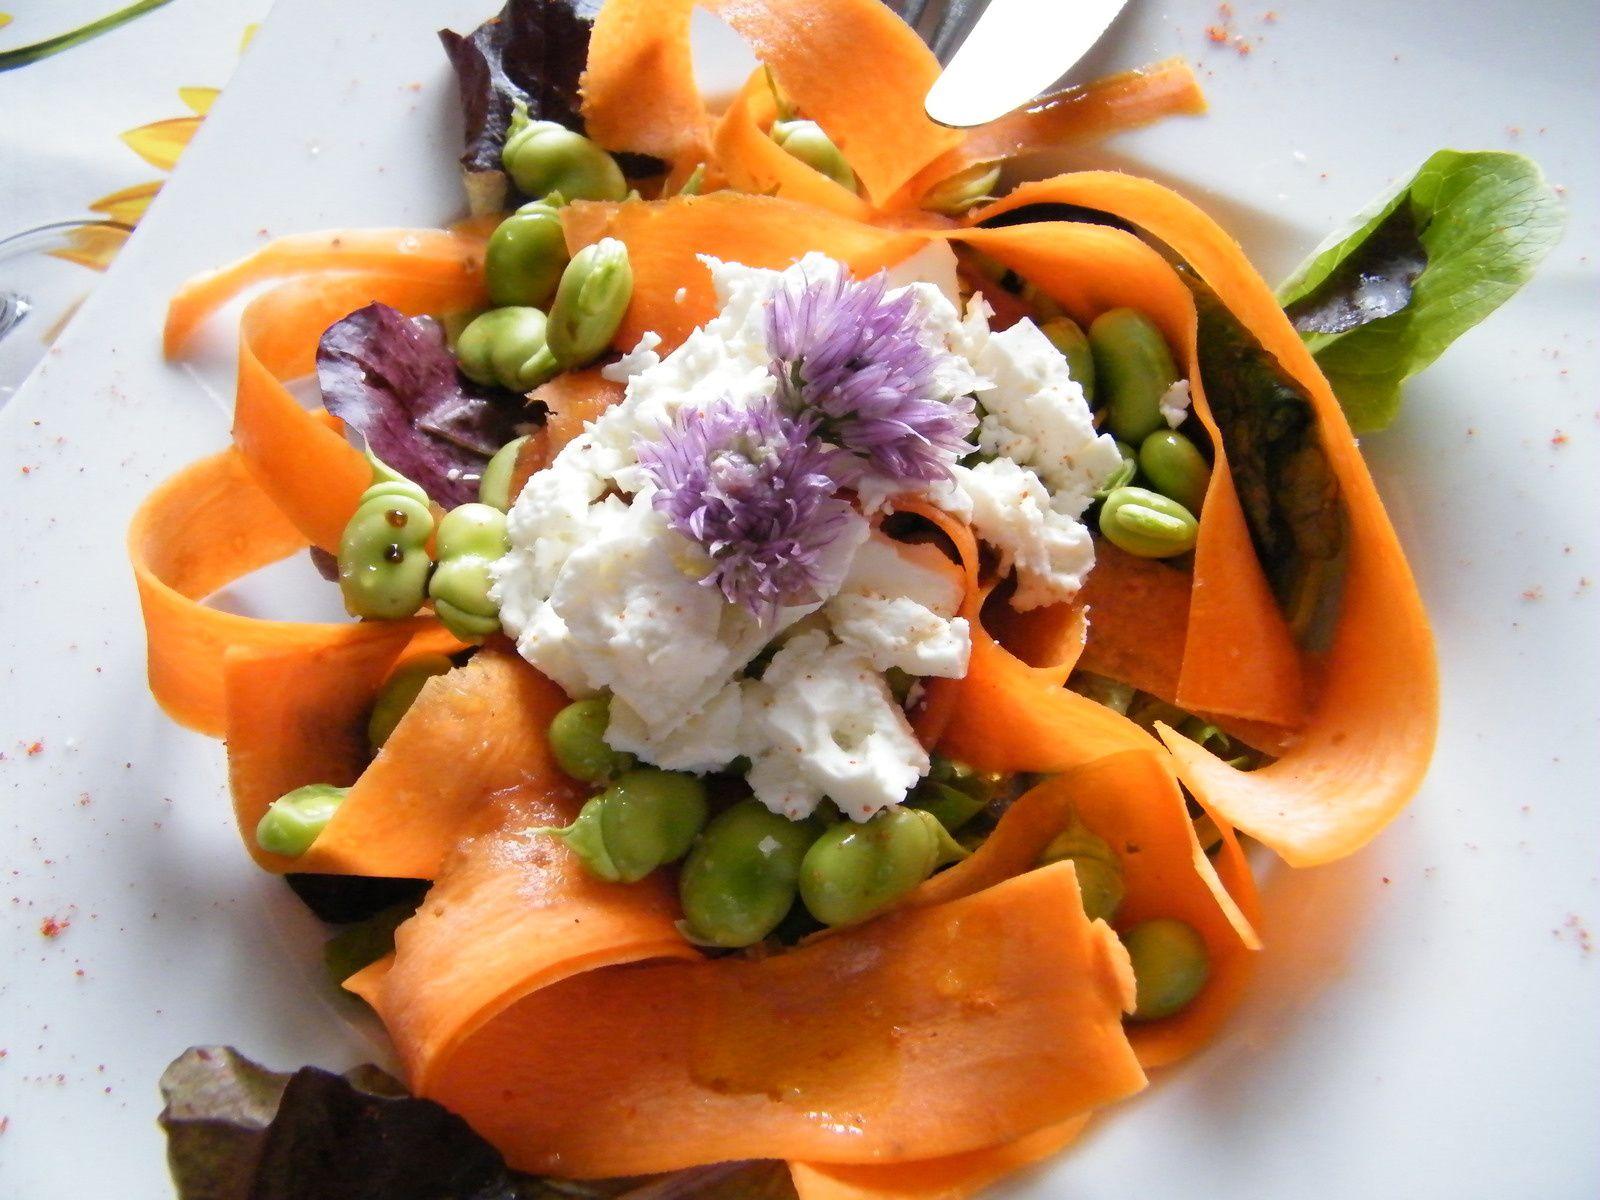 Petite salade qui croque, qui croque